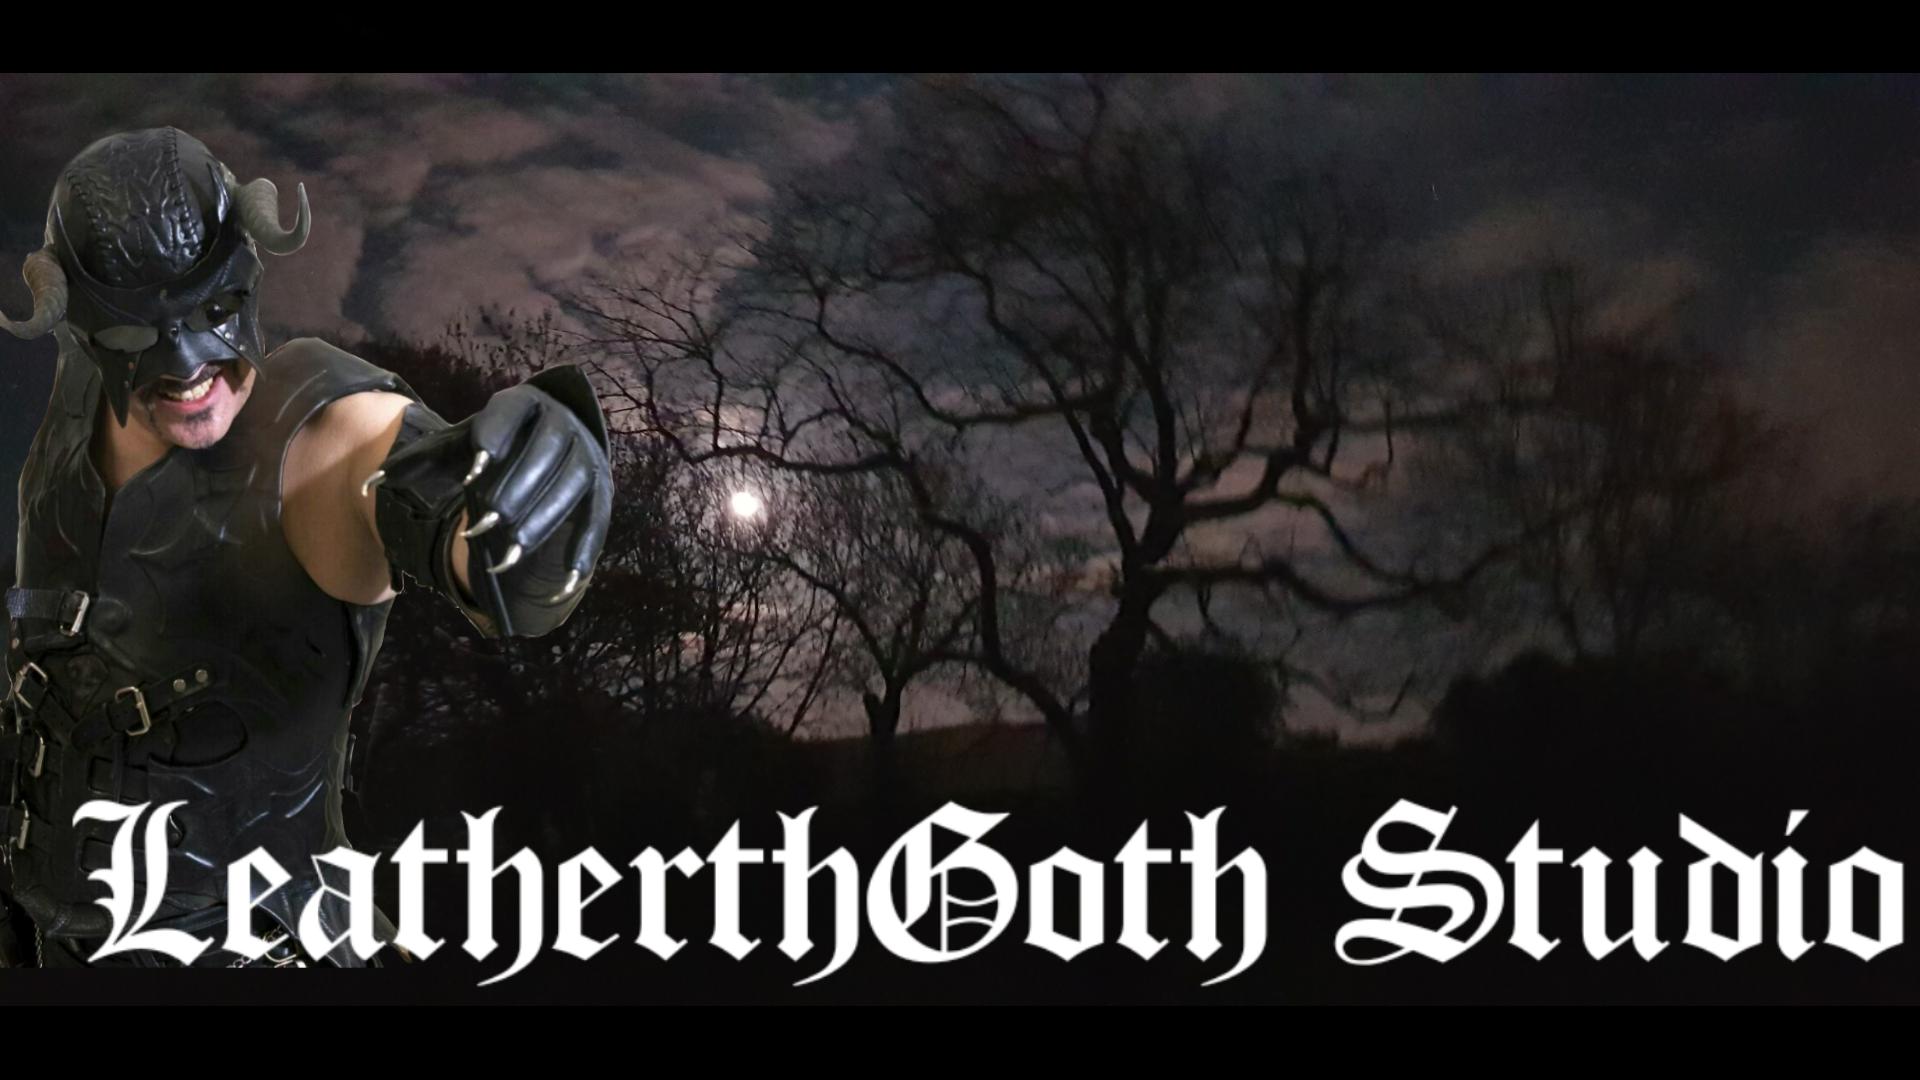 LeatherGoth Banner